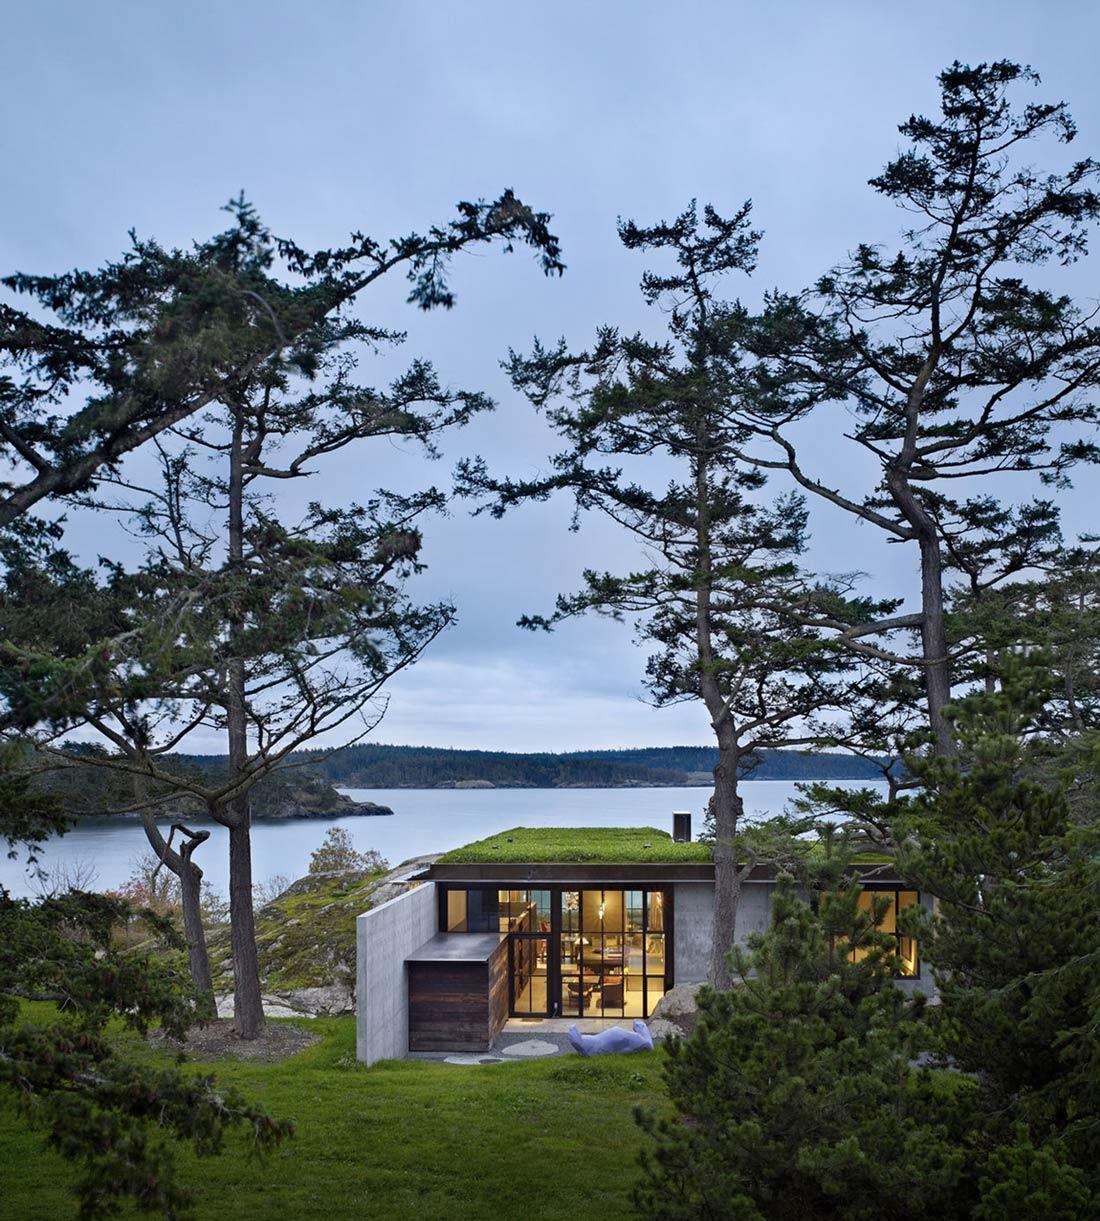 Green Roof, Garden, Ocean Views, The Pierre on San Juan Island by Olson Kundig Architects